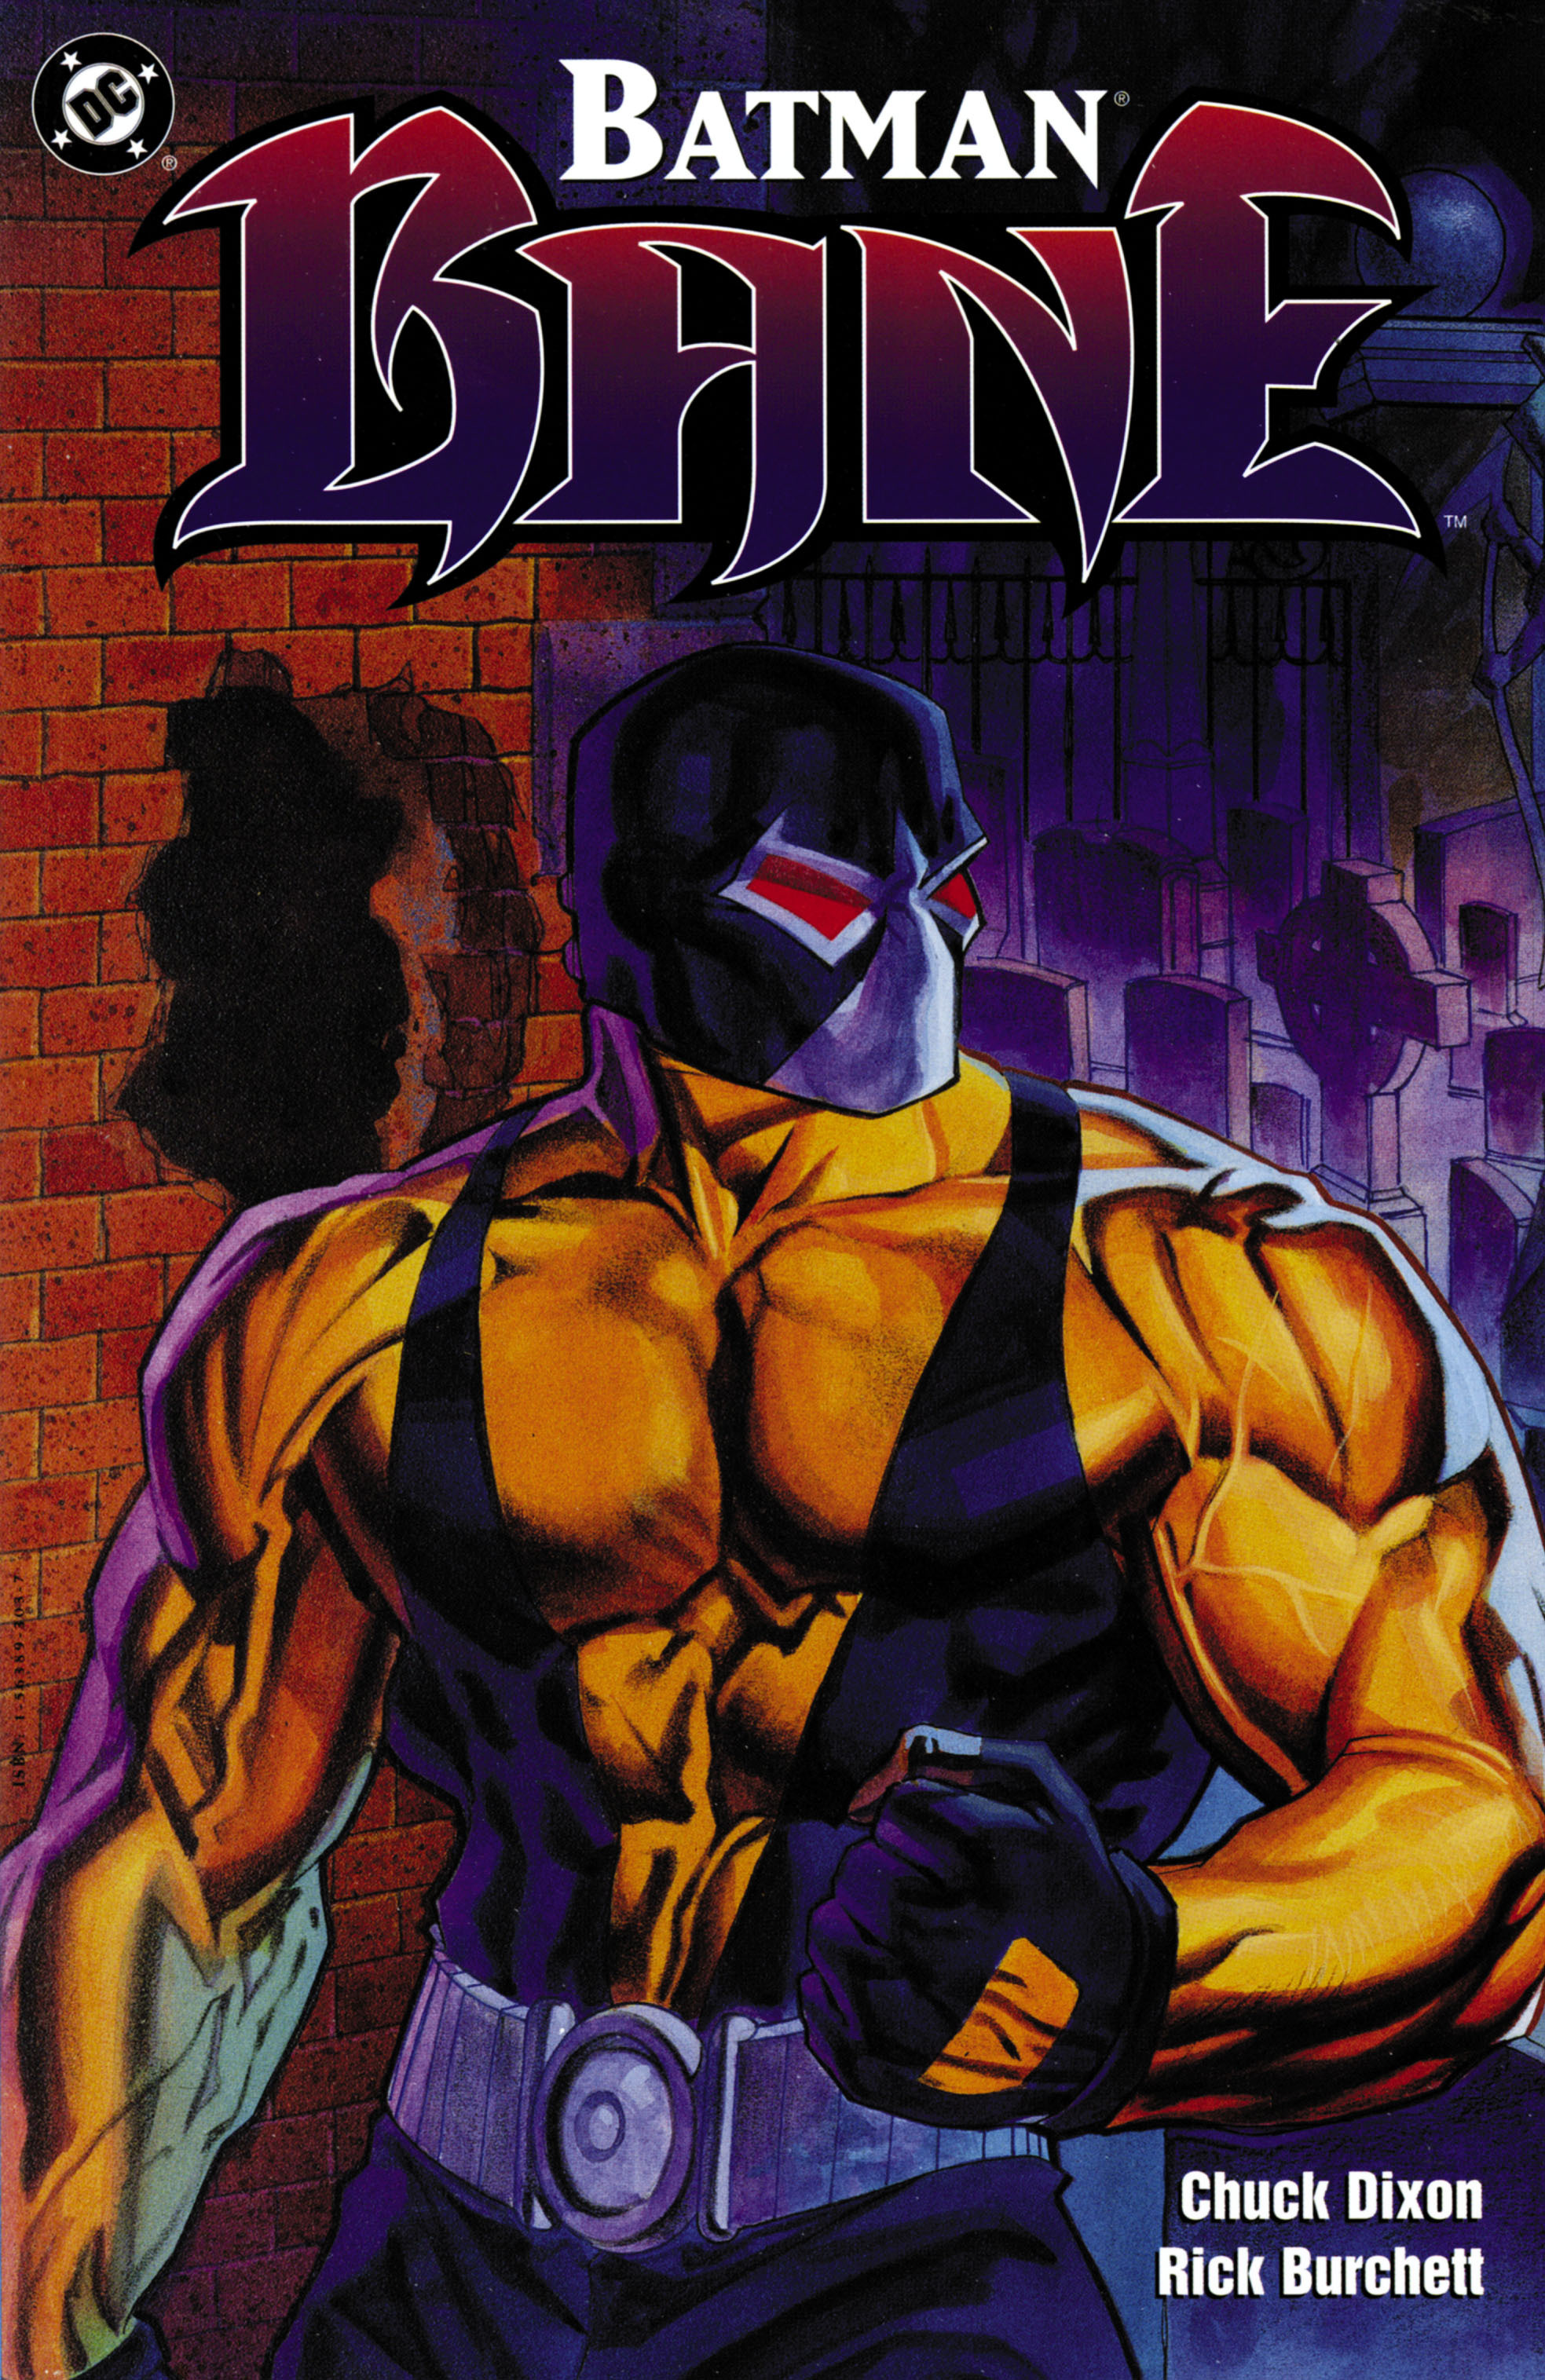 Read online Batman: Bane comic -  Issue # Full - 1